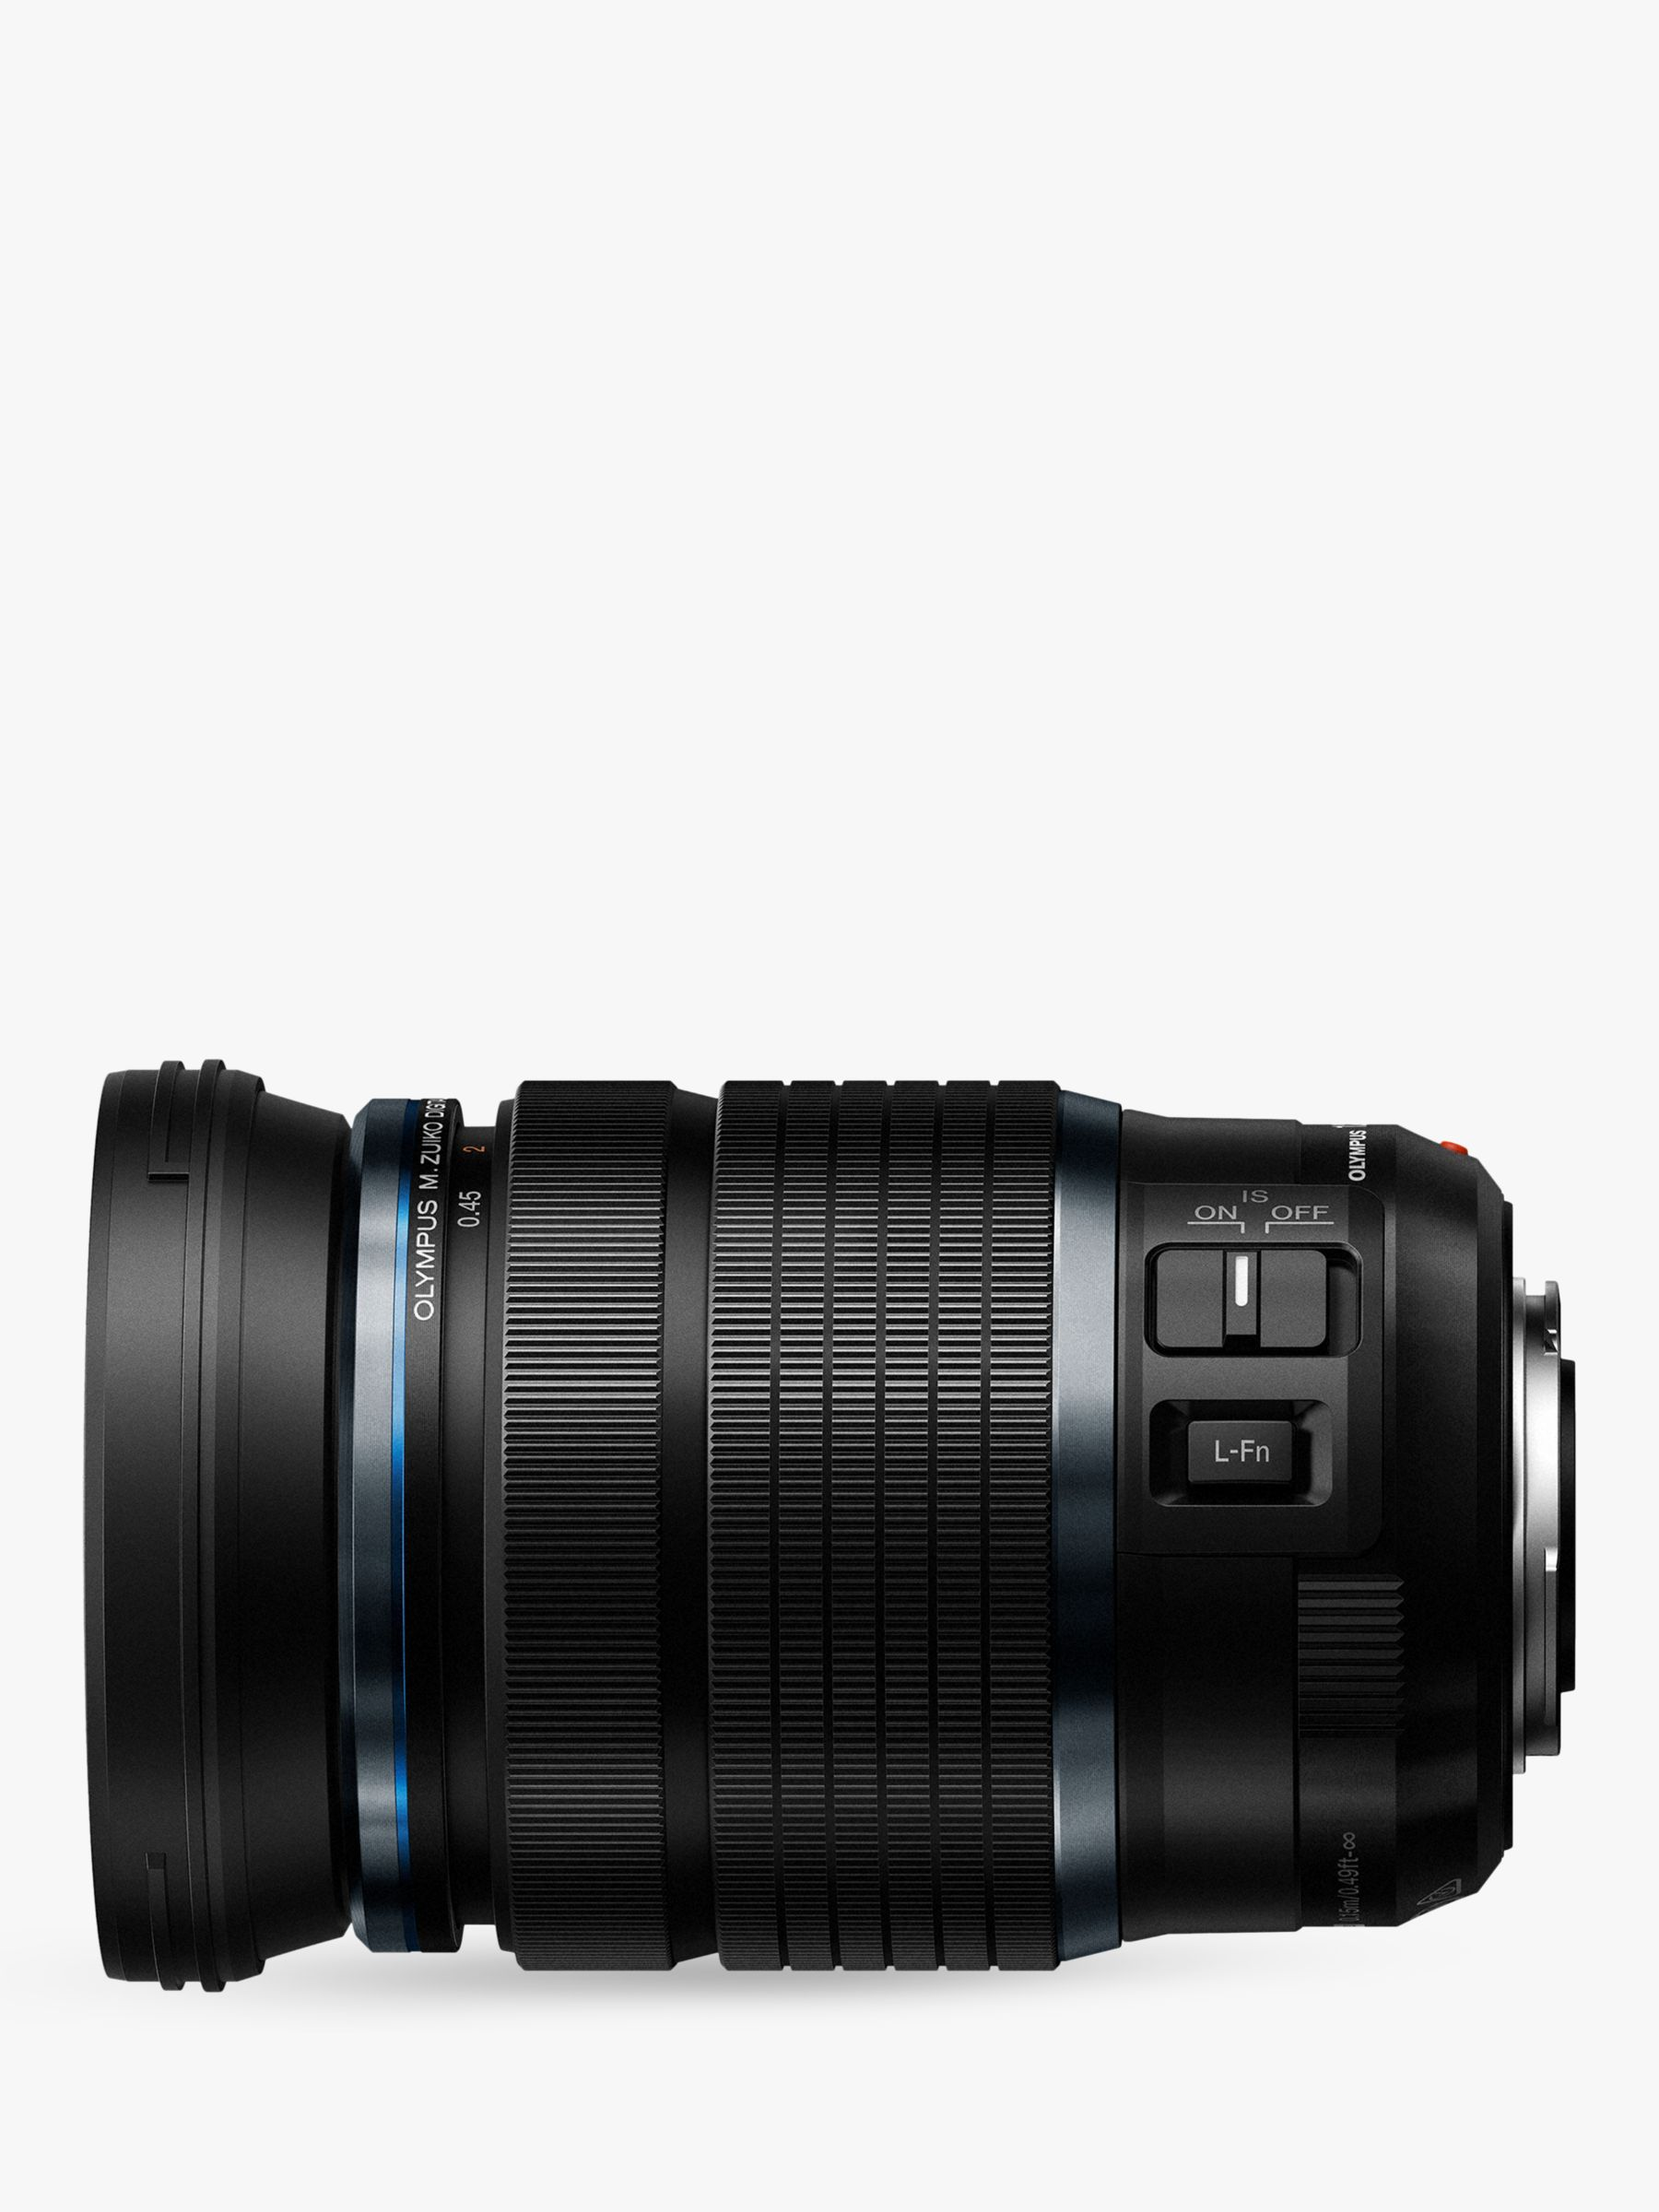 Olympus Olympus M.ZUIKO DIGITAL 12-100mm f/4.0 ED IS Pro Lens